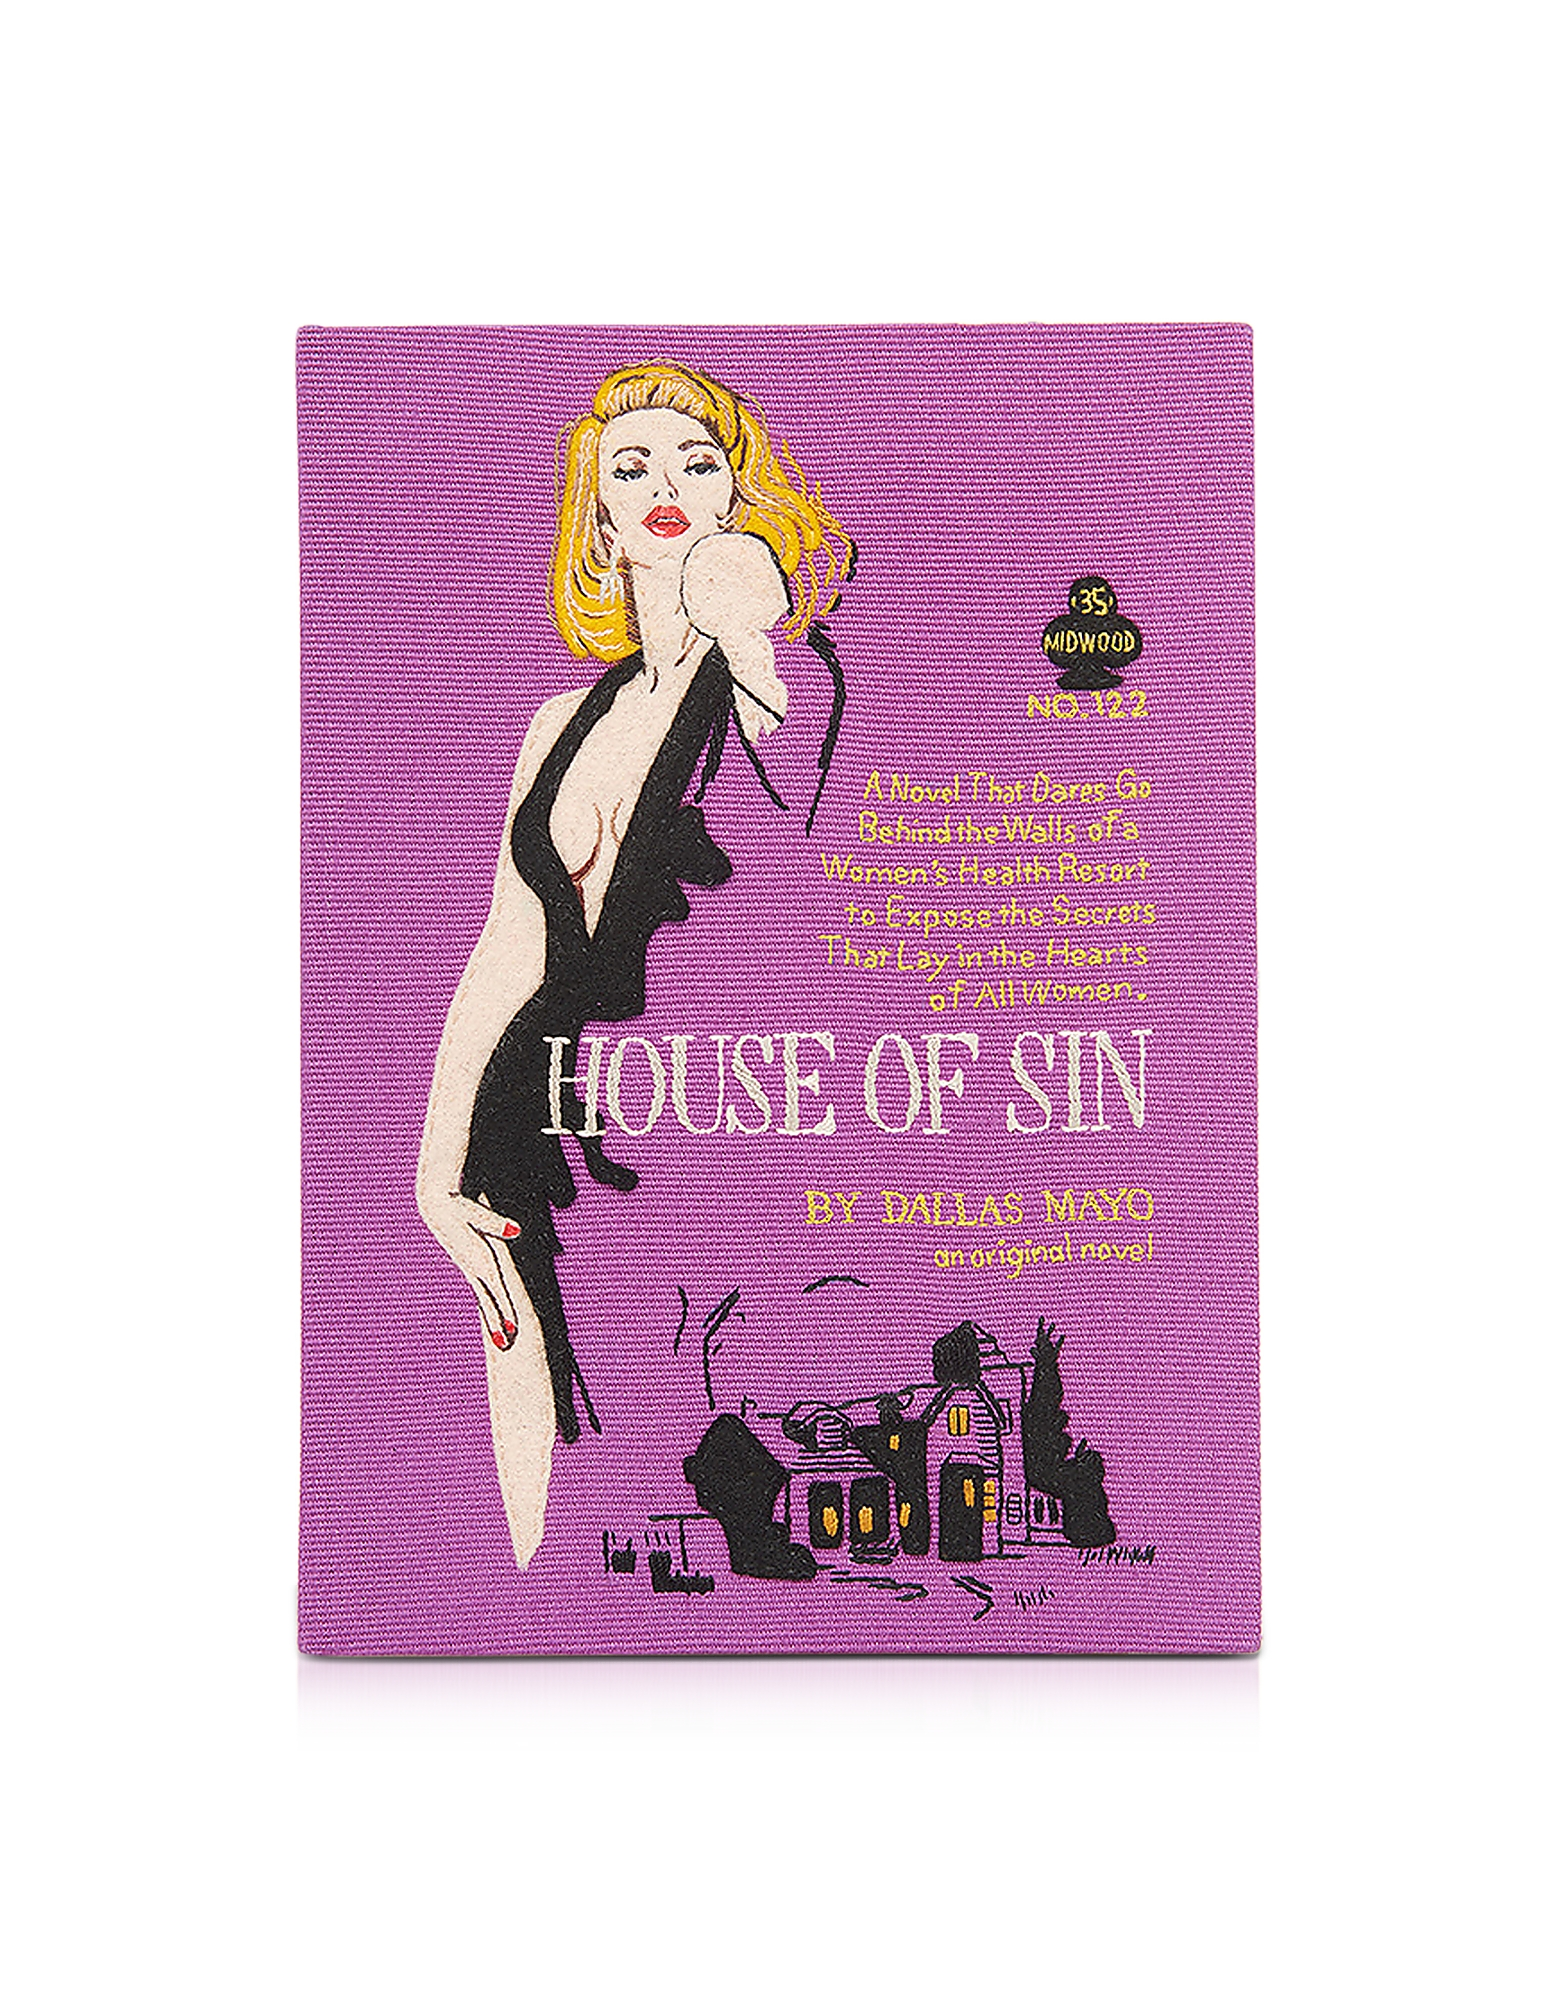 Olympia Le-Tan Handbags, House of Sin Book Clutch